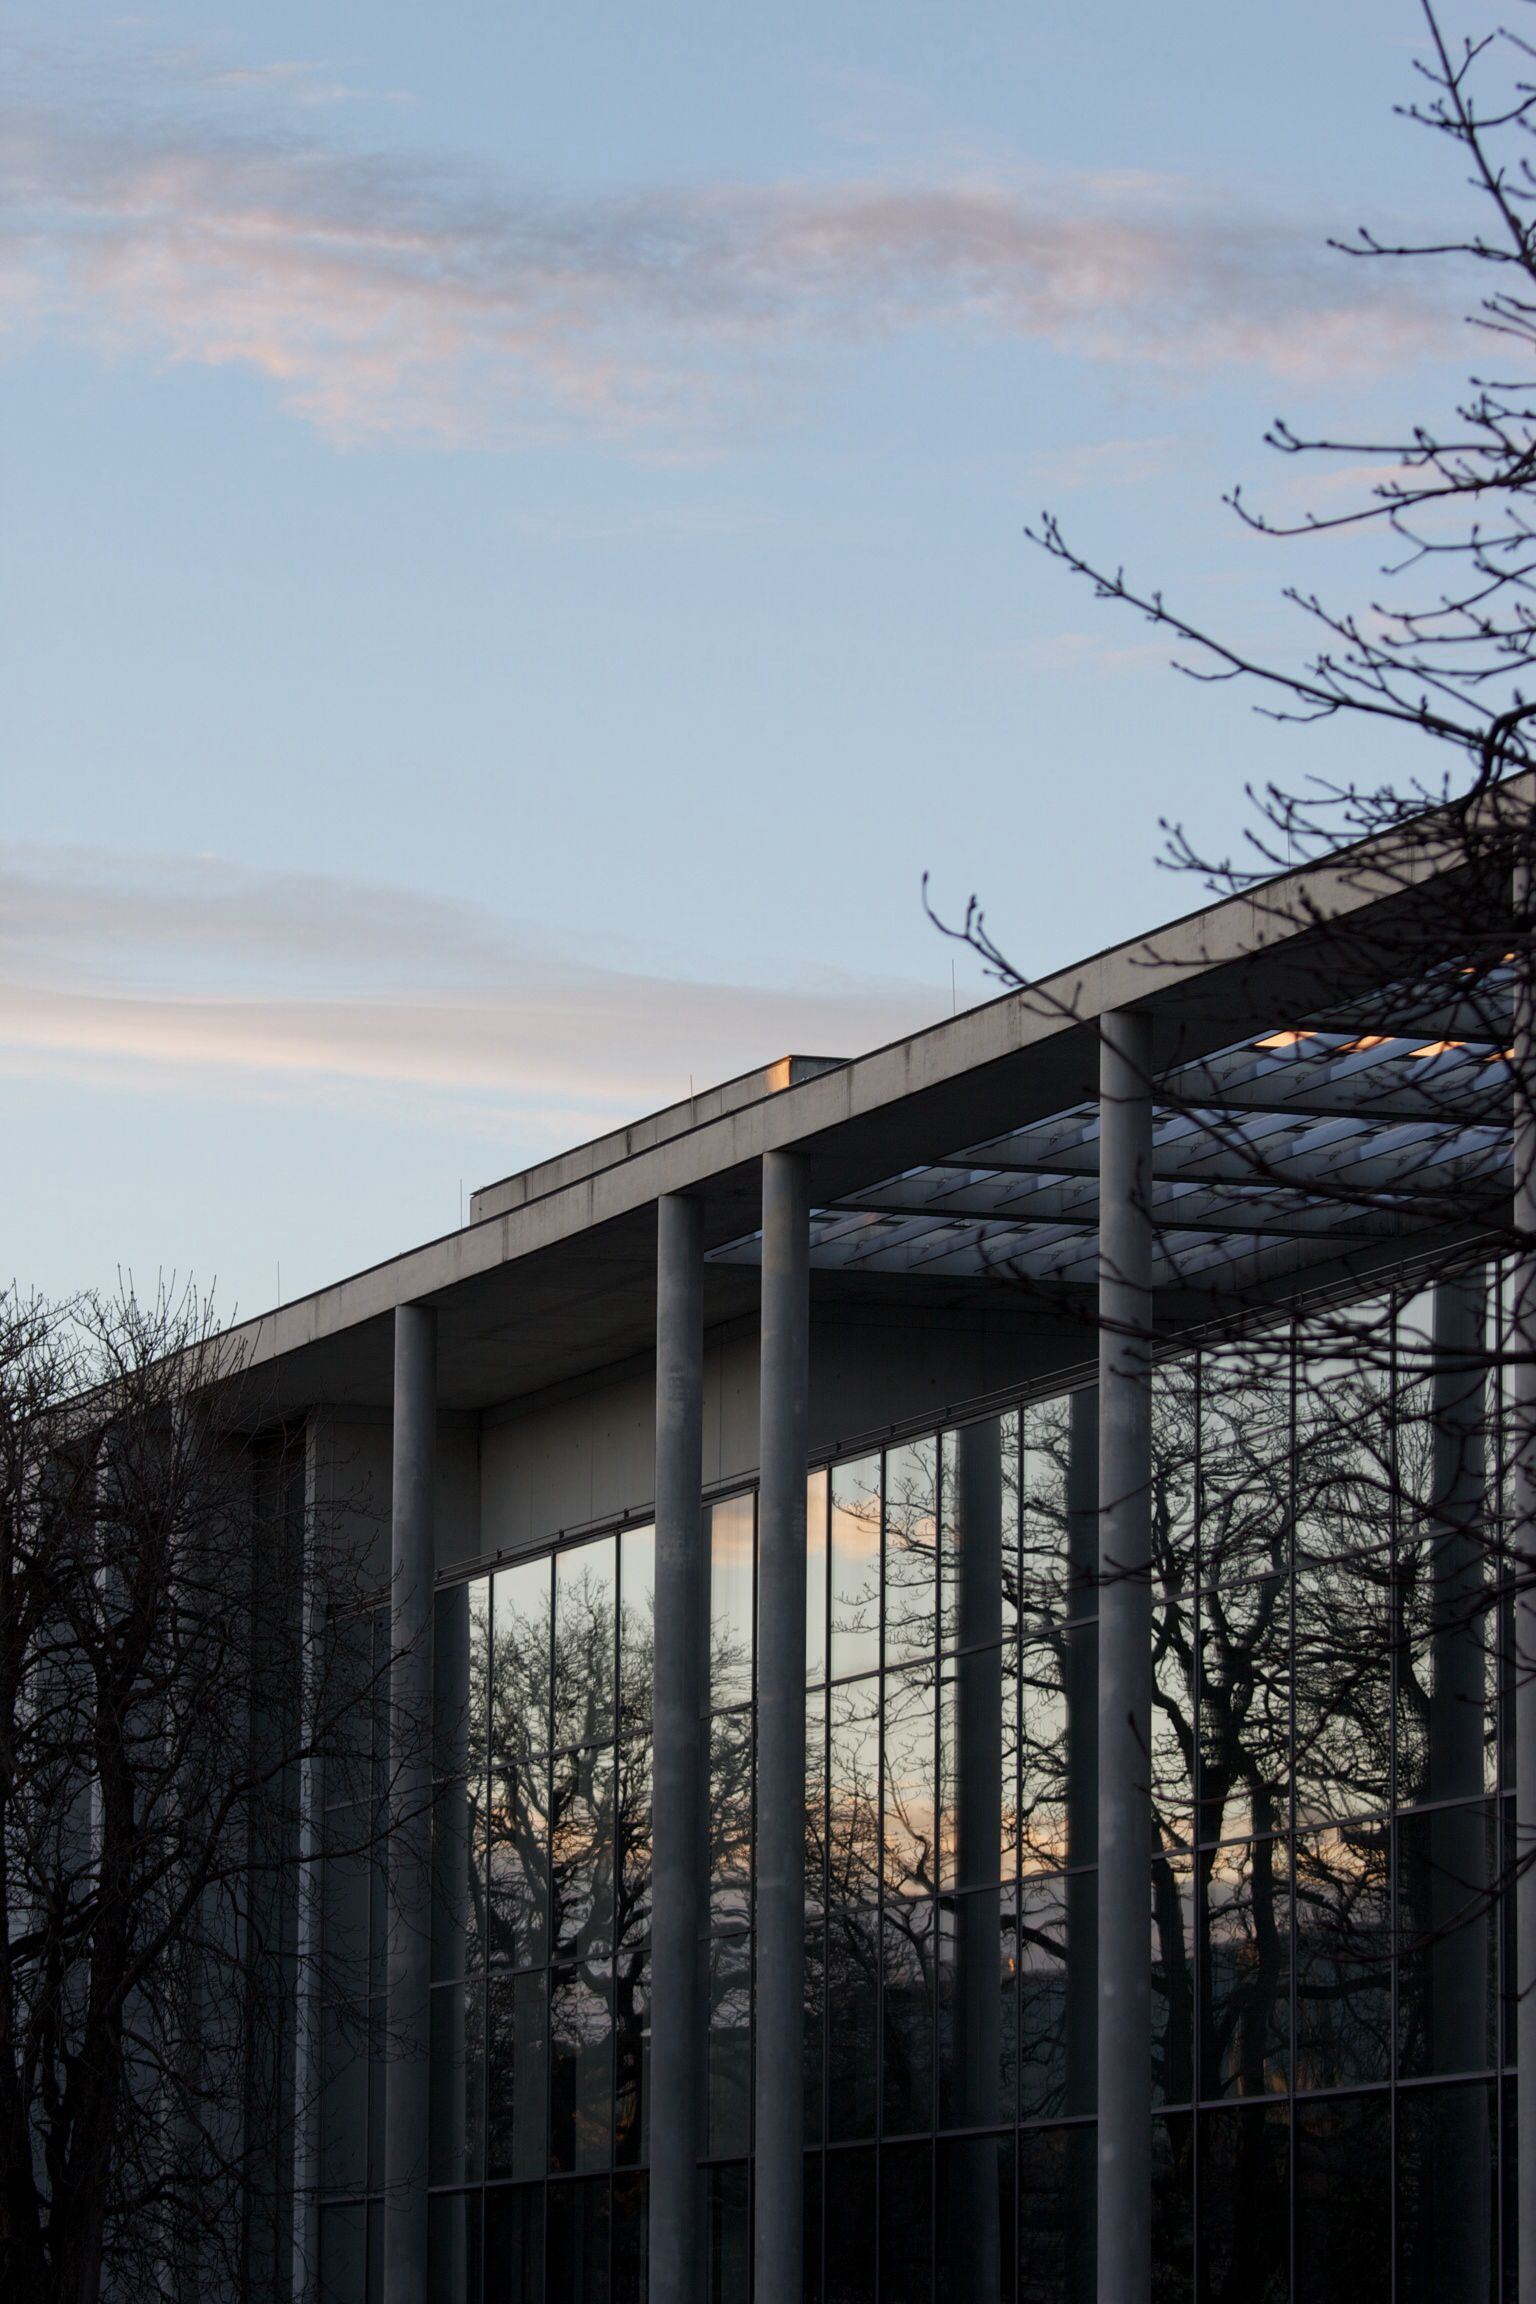 Munich, Pinakothek der Moderne